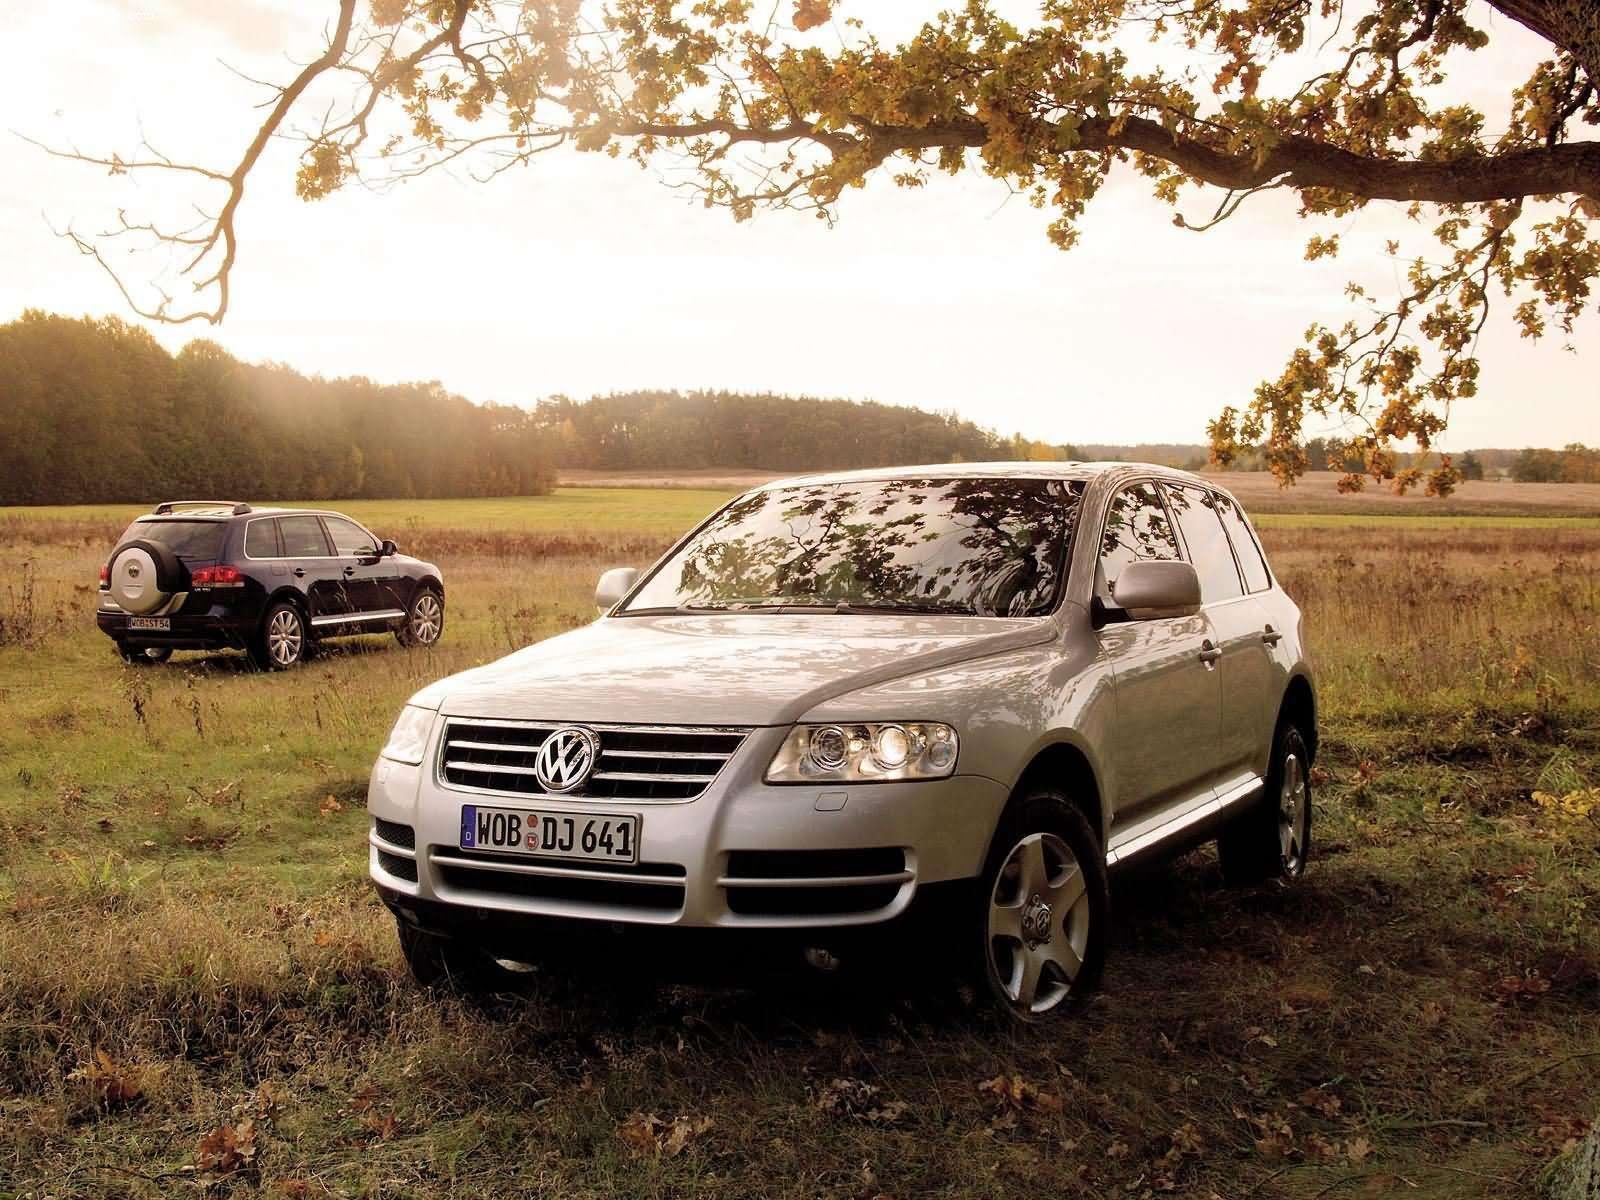 VW - Off road